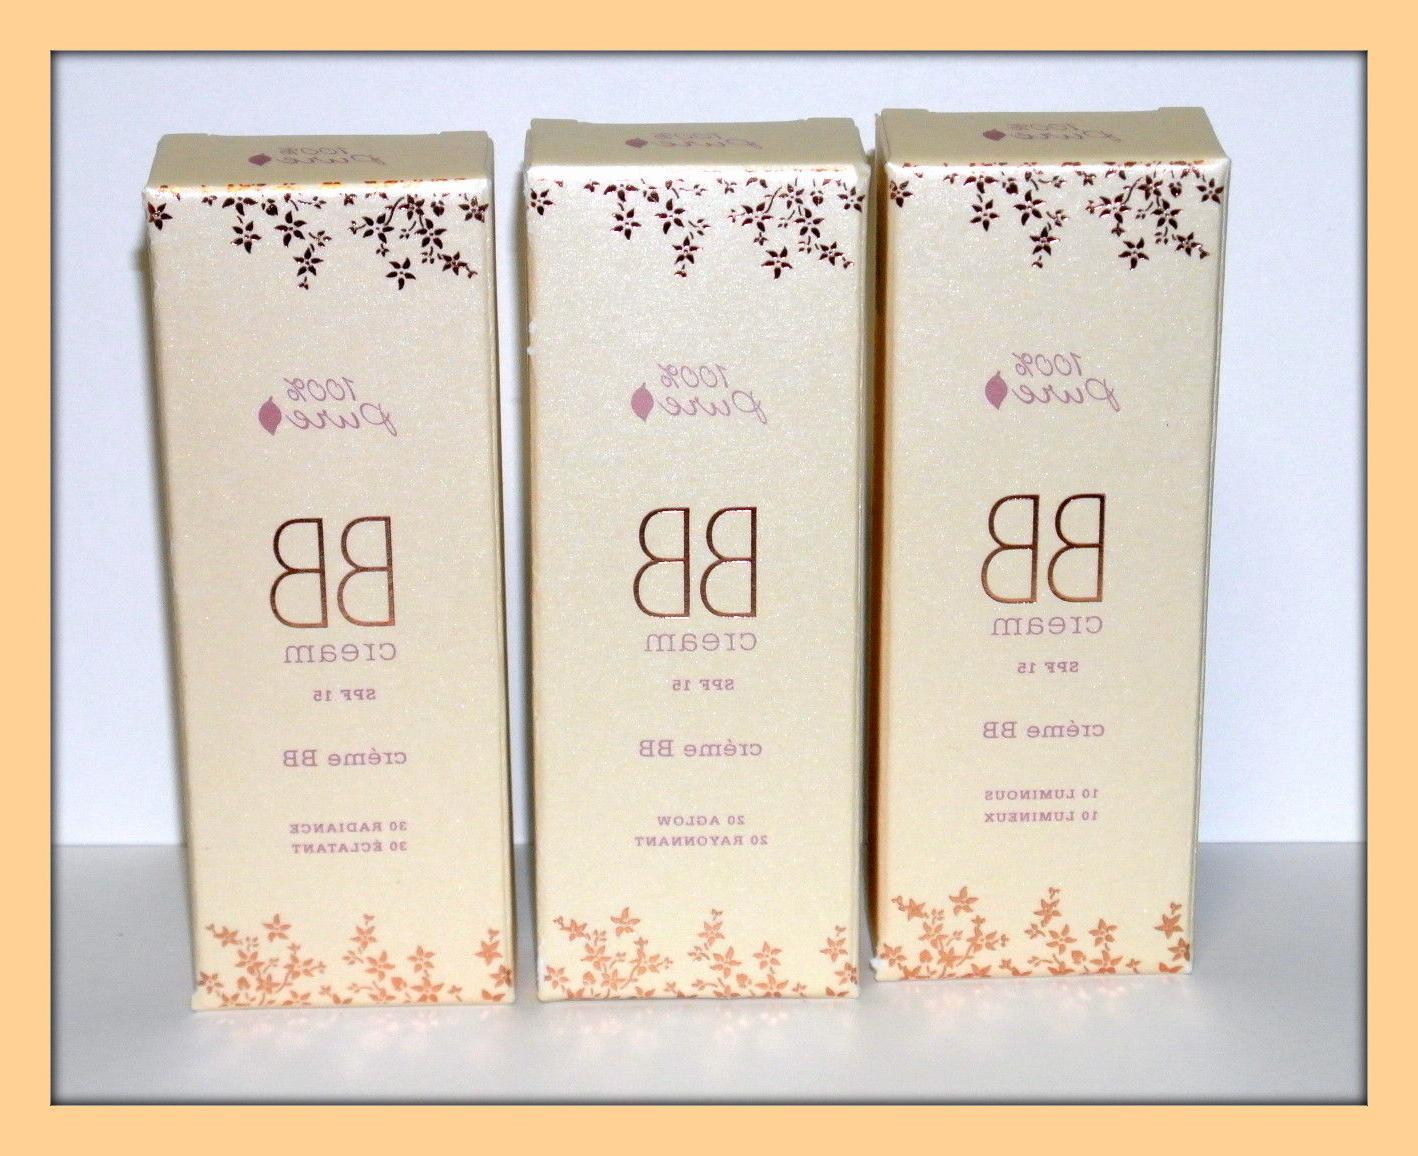 100% Pure BB Cream SPF 15 Luminous Aglow Radiance Full size